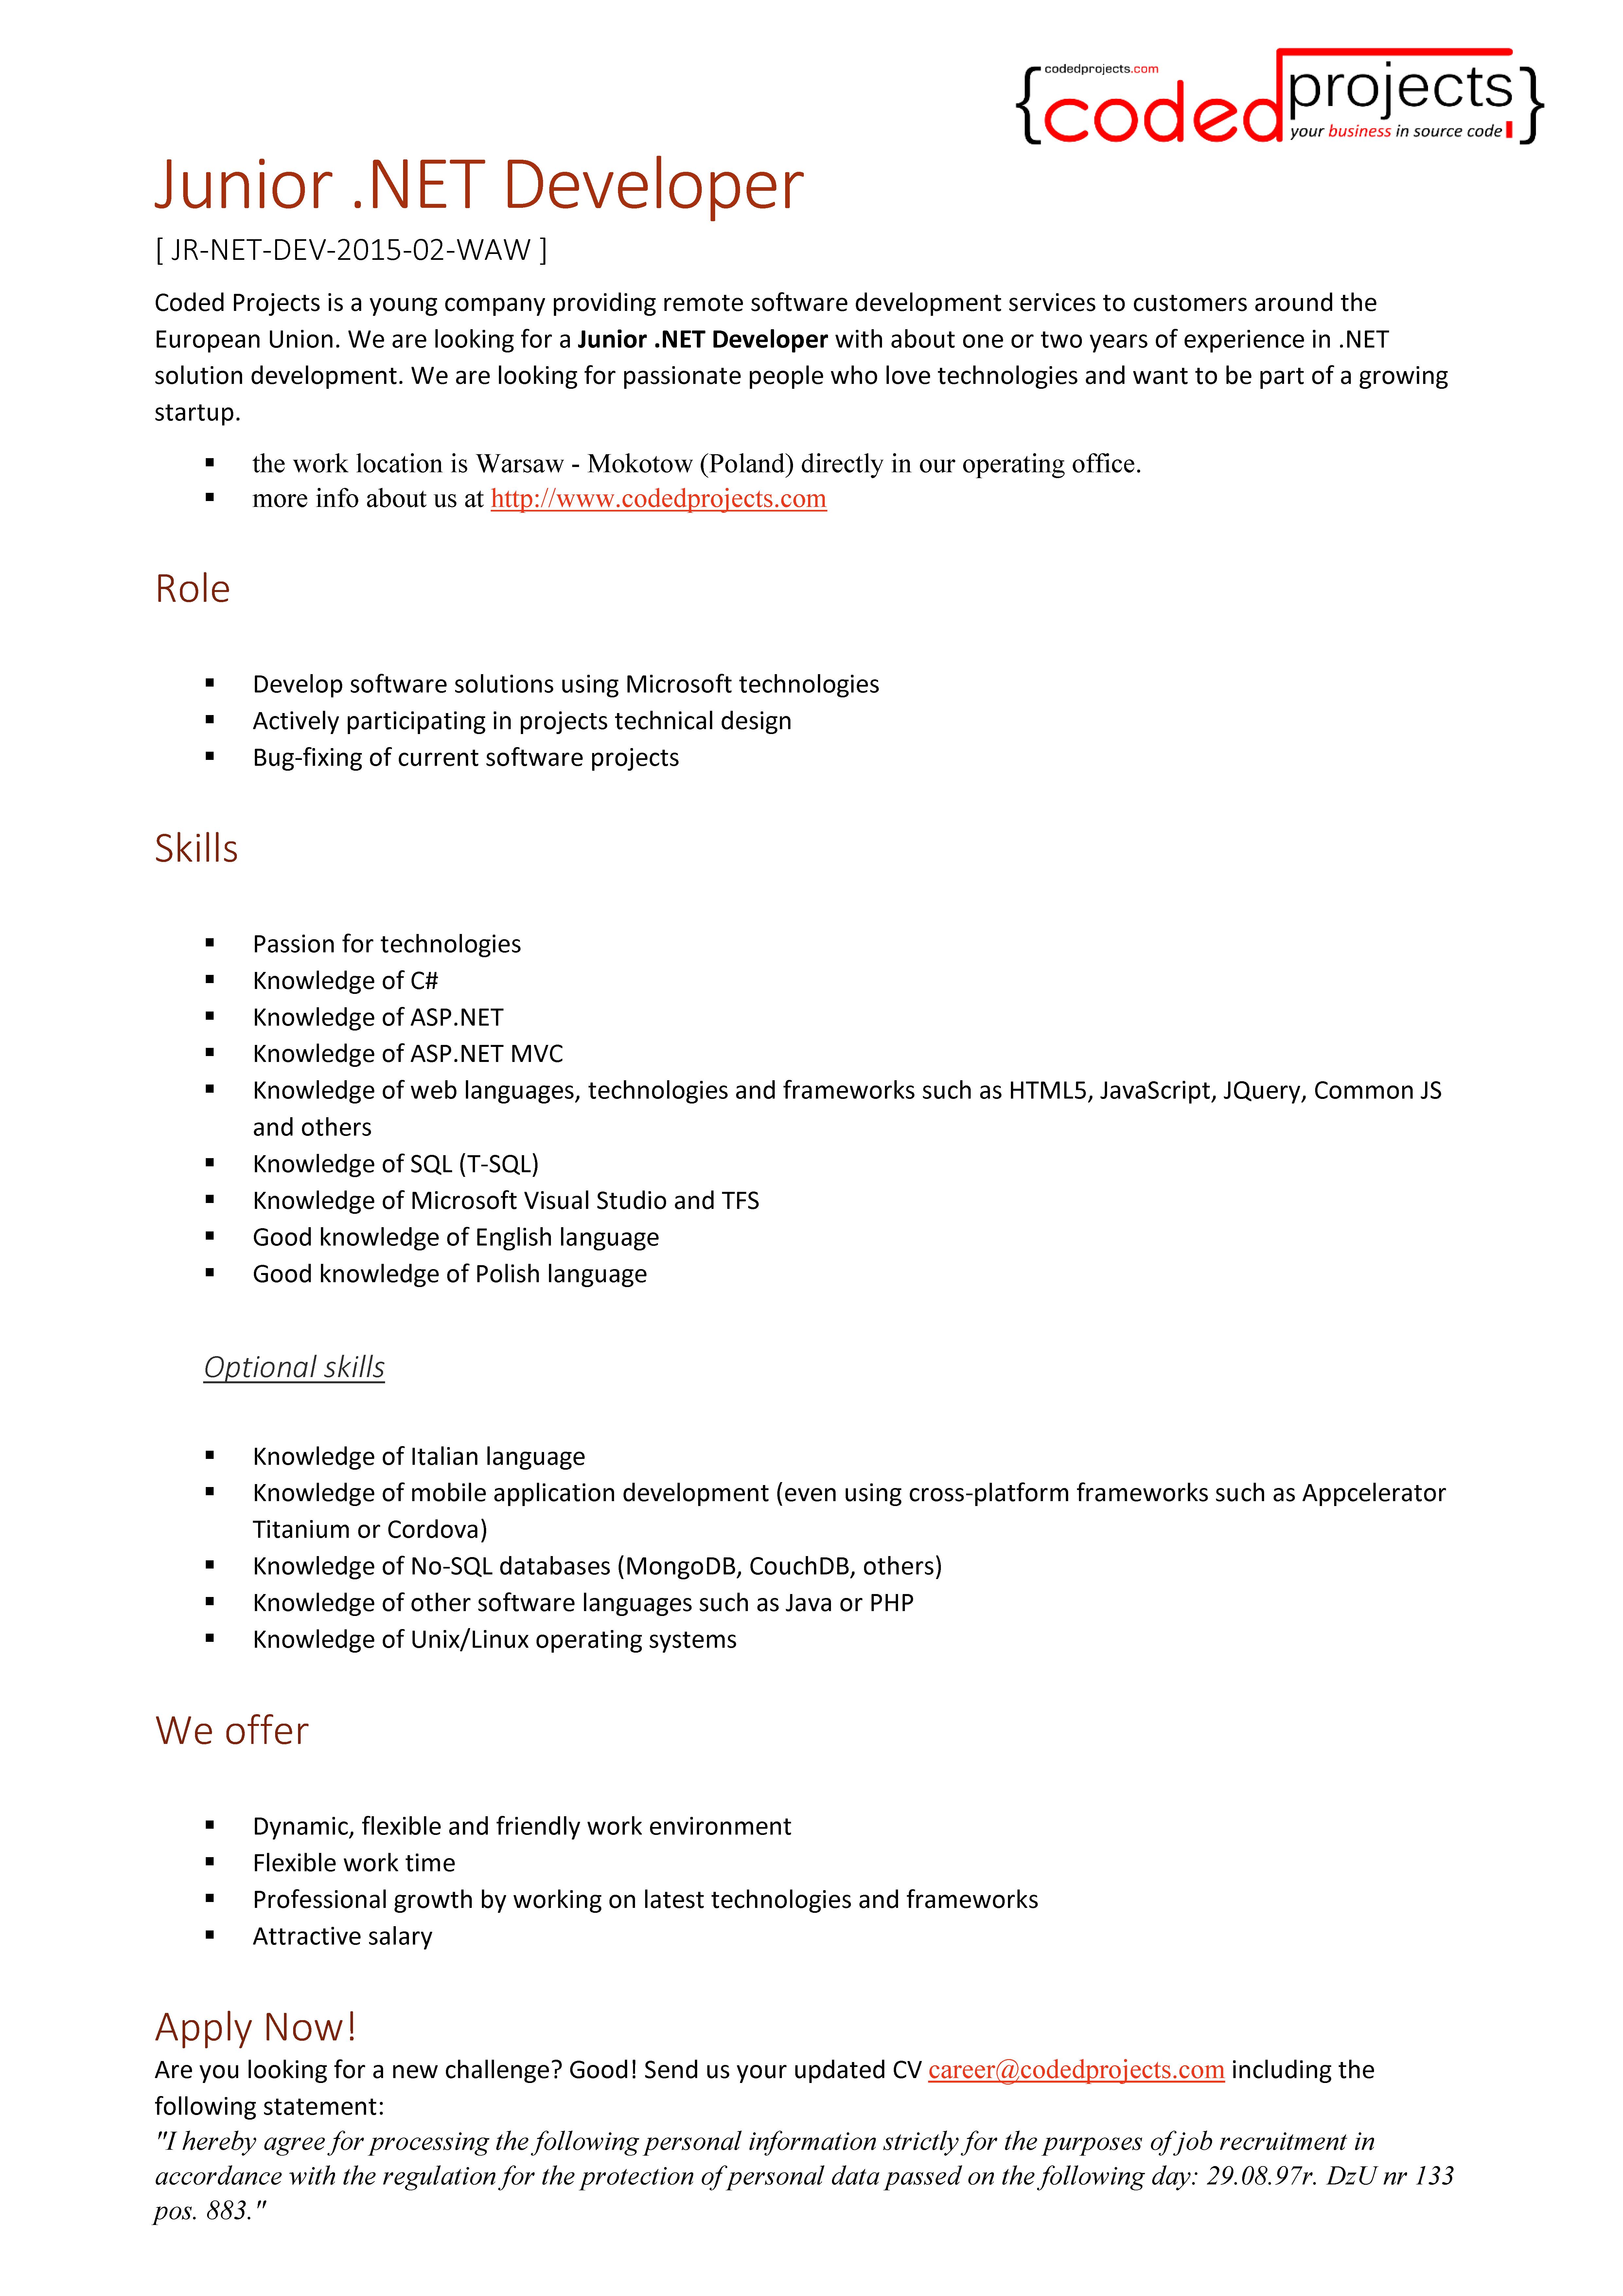 Career - Coded Projects - JR-NET-DEV-2018-03-WAW - Junior